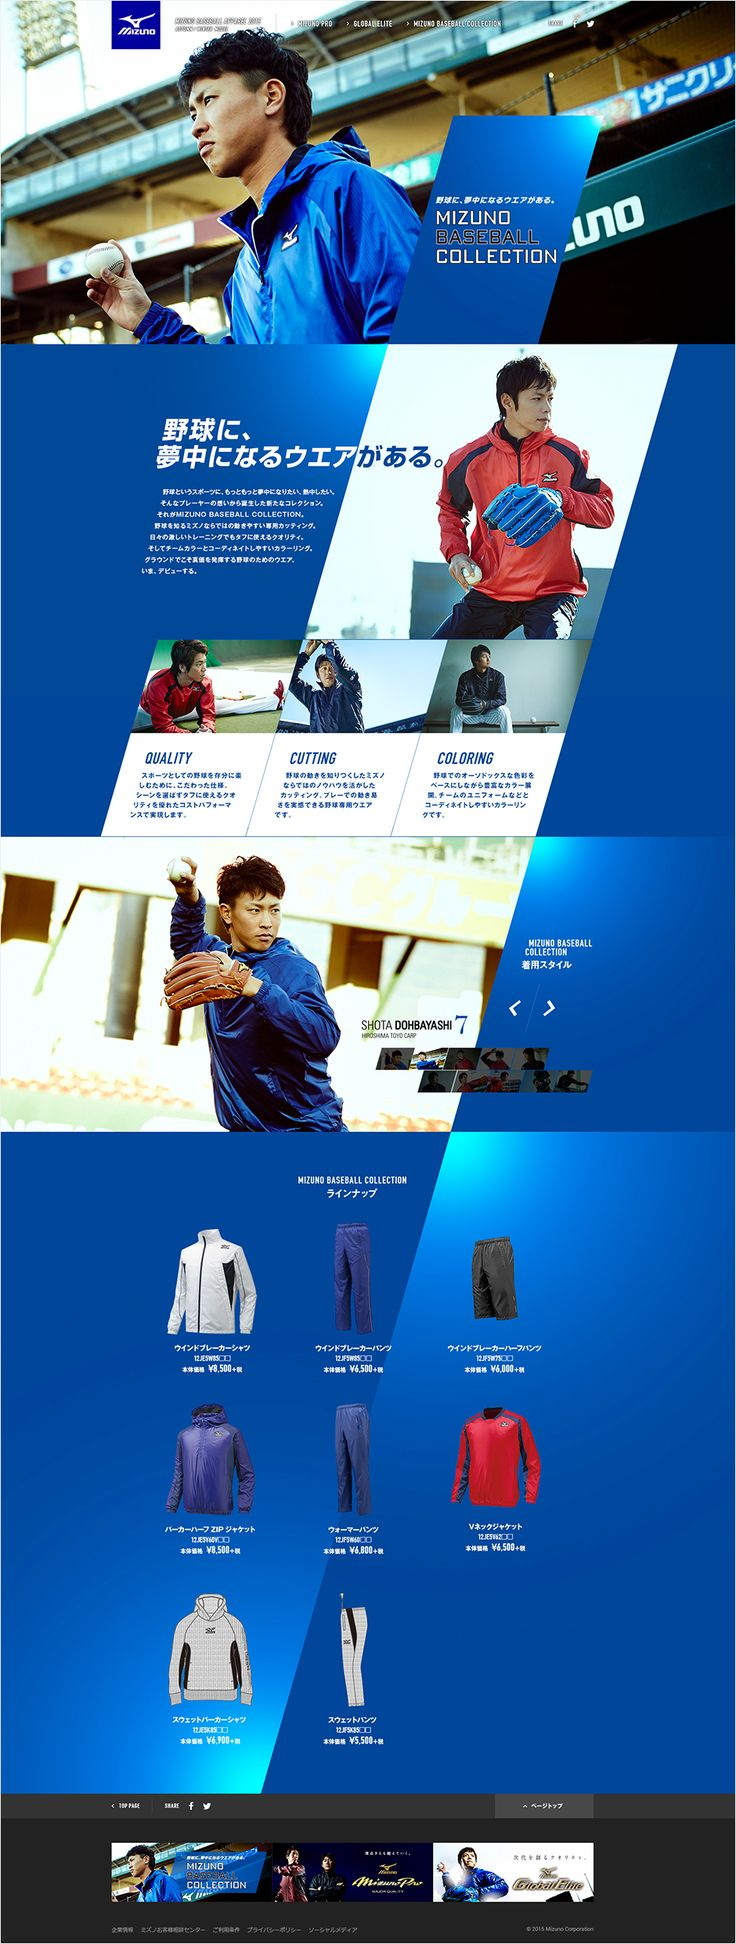 MIZUNO BASEBALL APPAREL 2015 AUTUMN / WINTER MODEL|WORKS|UNITBASE Inc.|株式会社ユニットベース                                                                                                                                                     もっと見る